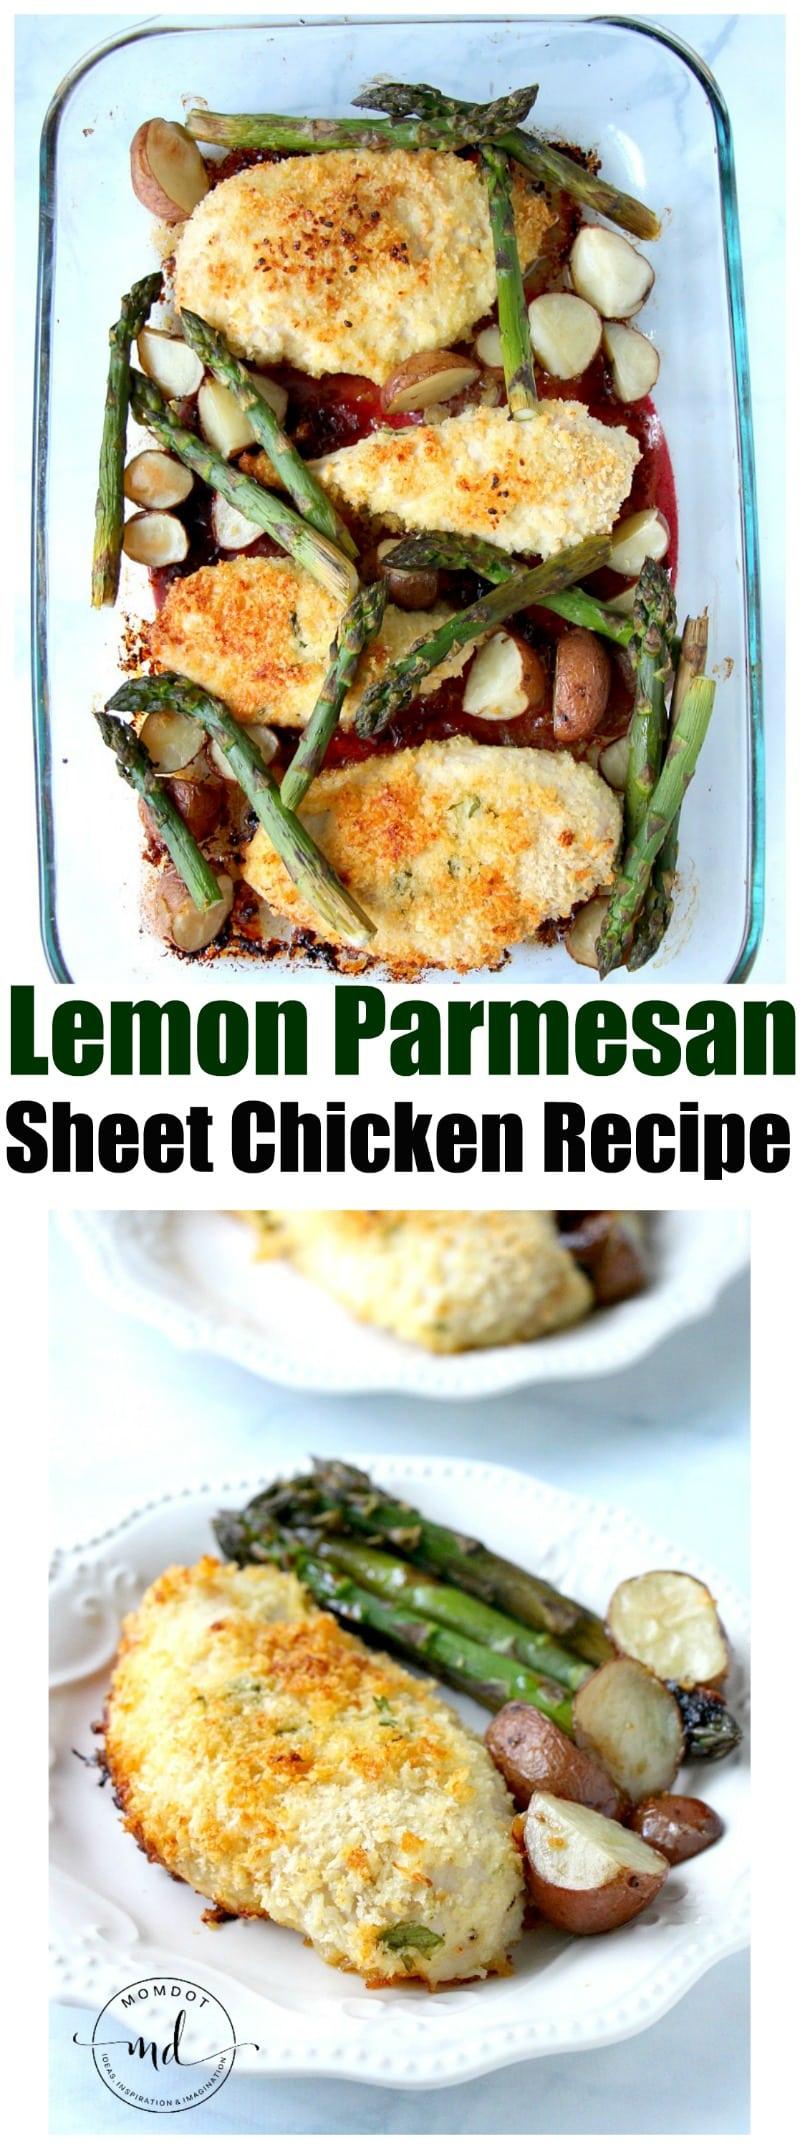 Lemon Parmesan Chicken lemon parmesan sheet chicken recipe - momdot